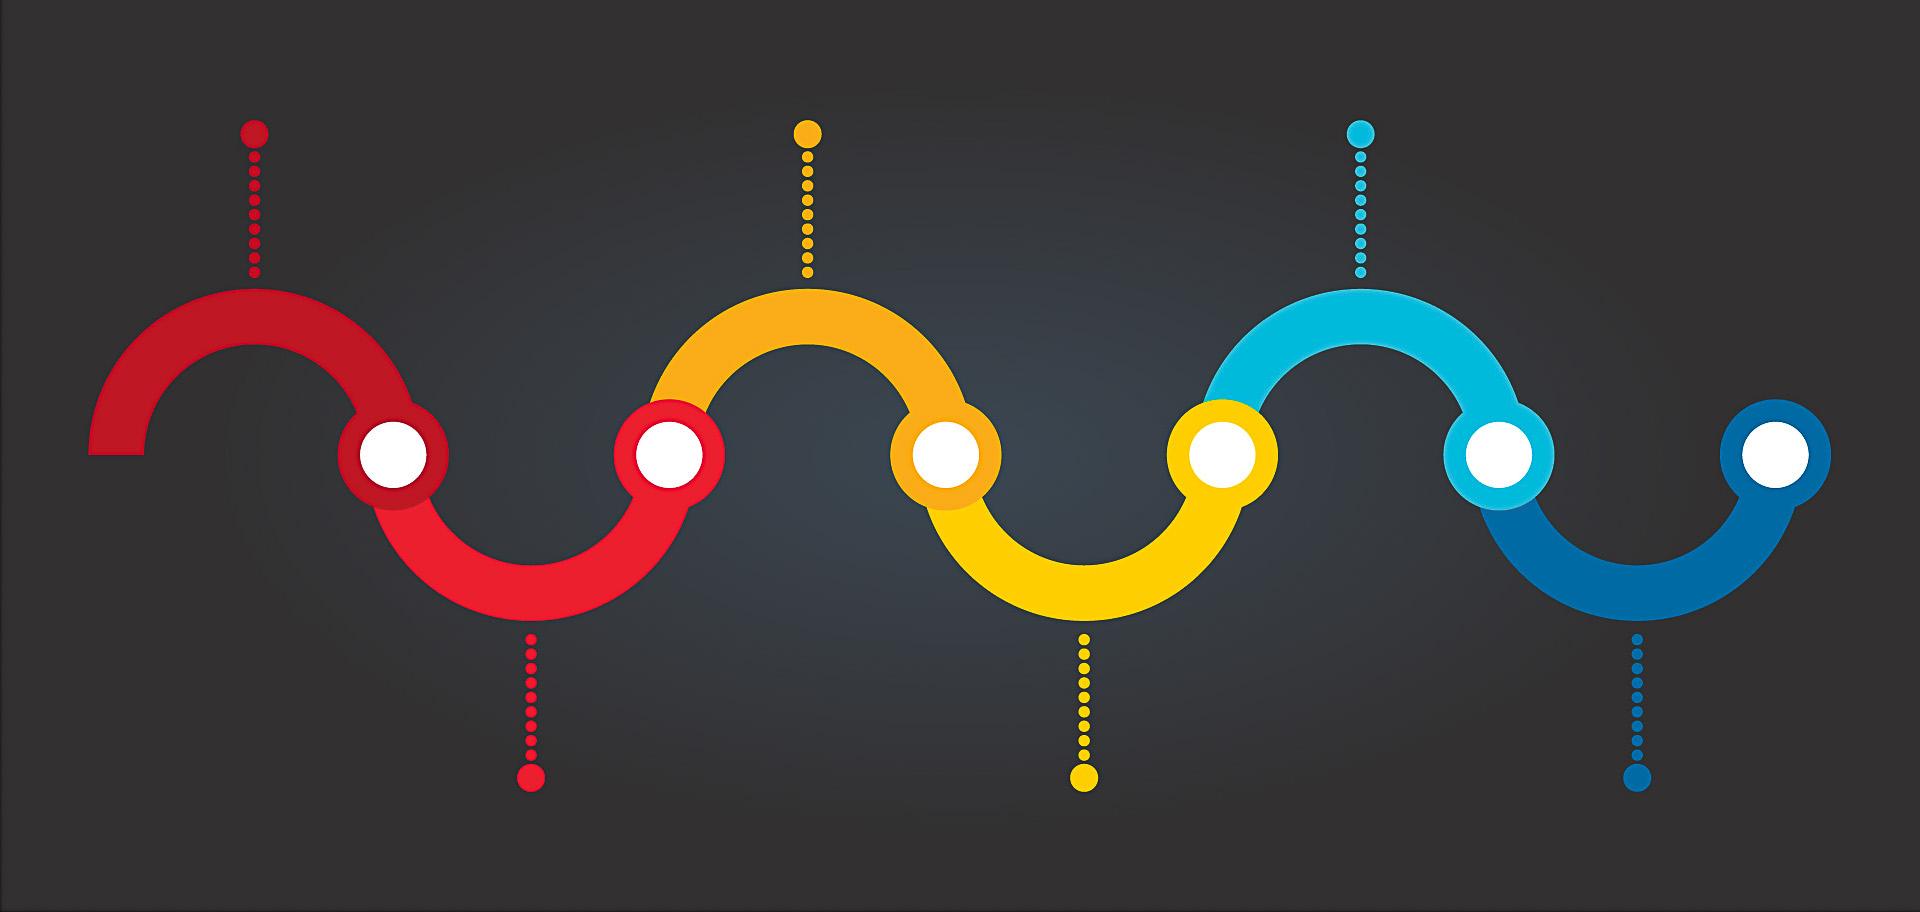 Logo Design Process: Kettle Fire's 6 Steps to a Stellar Logo